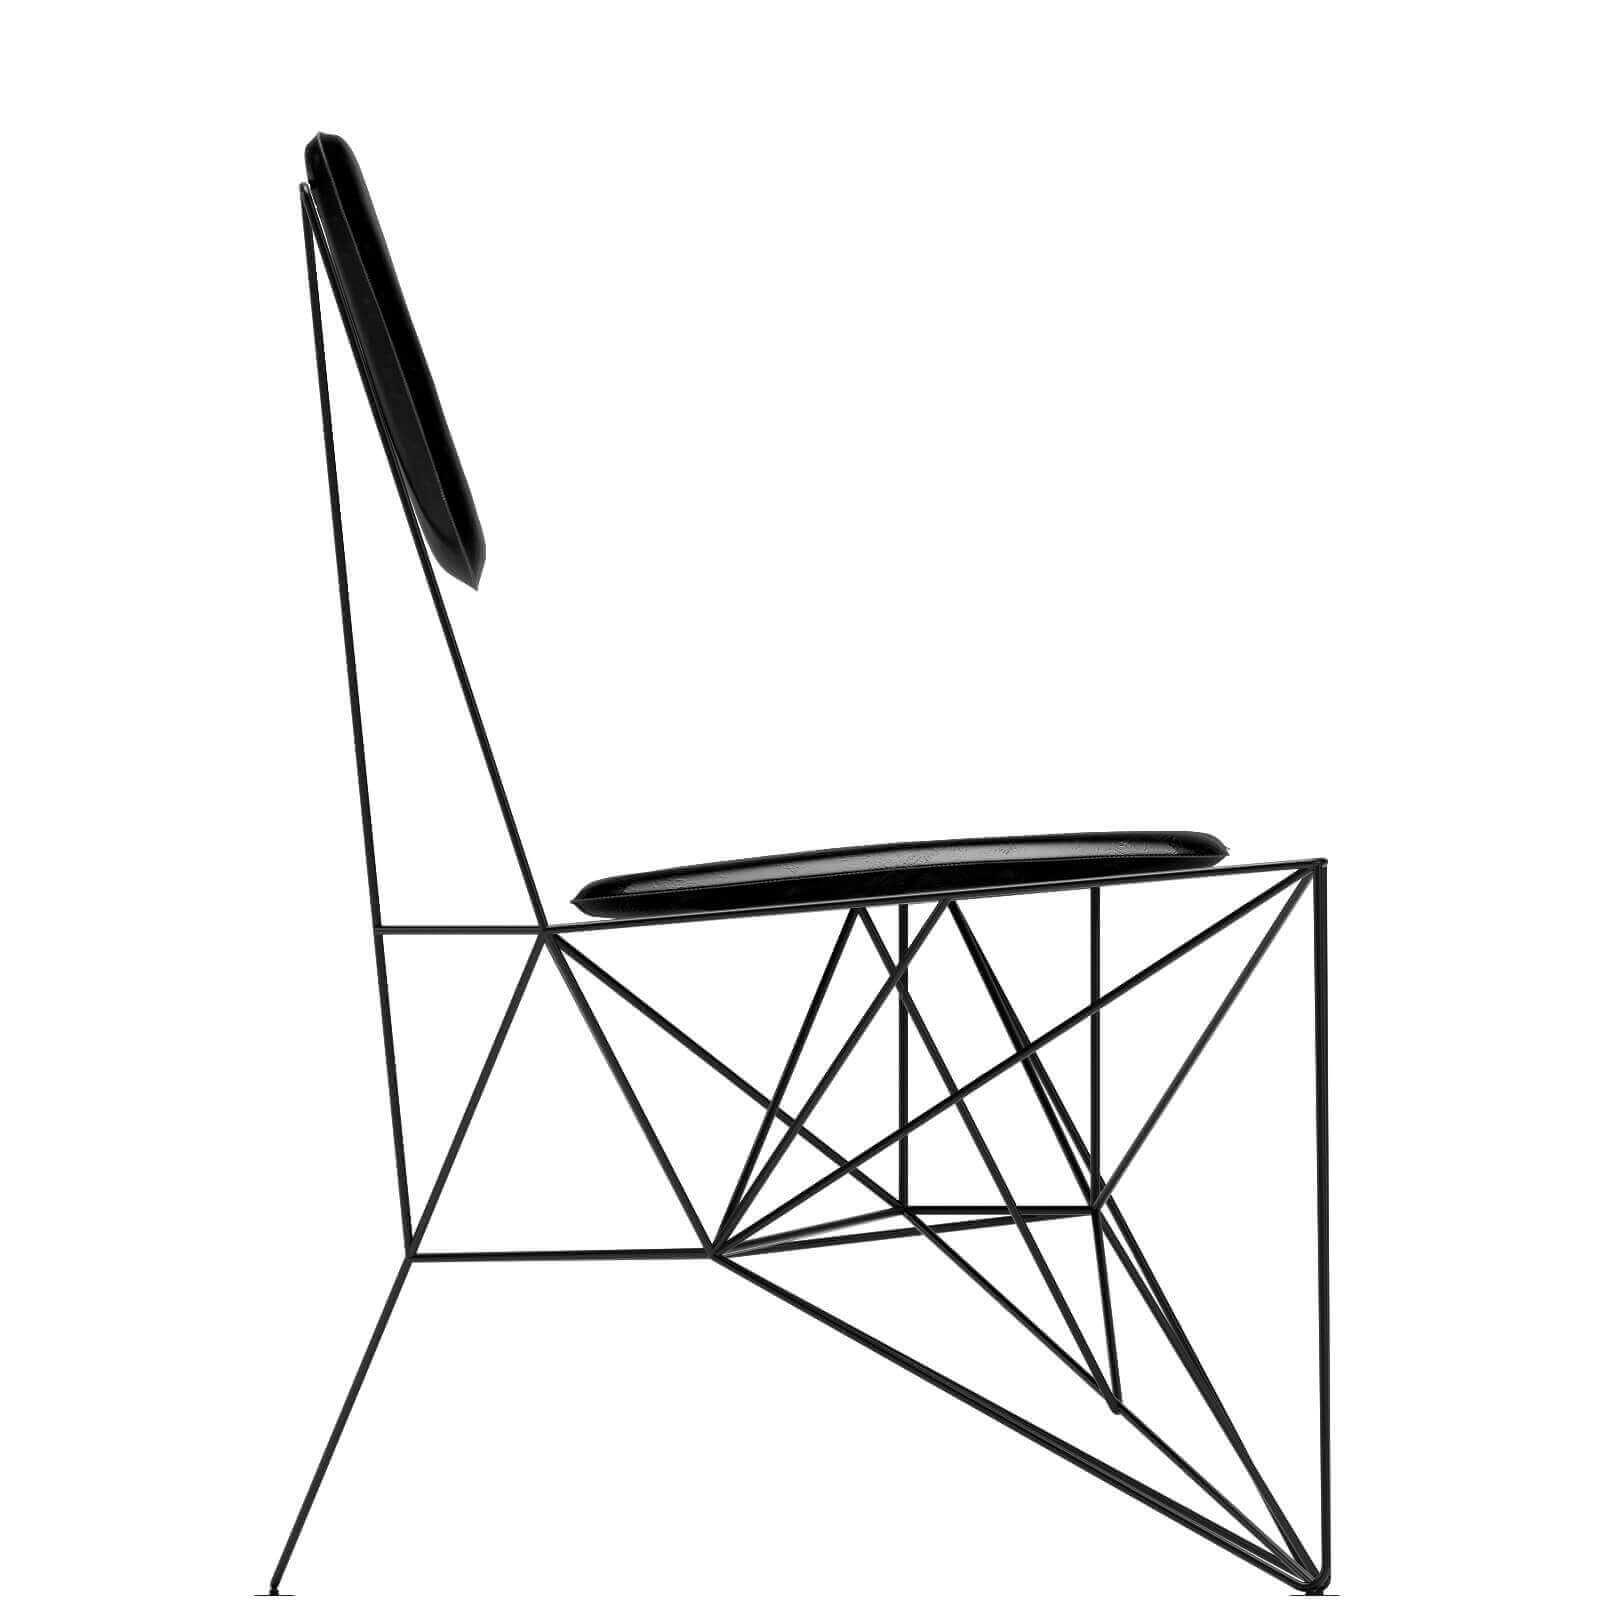 6mm Wire Chair – Ikonoform